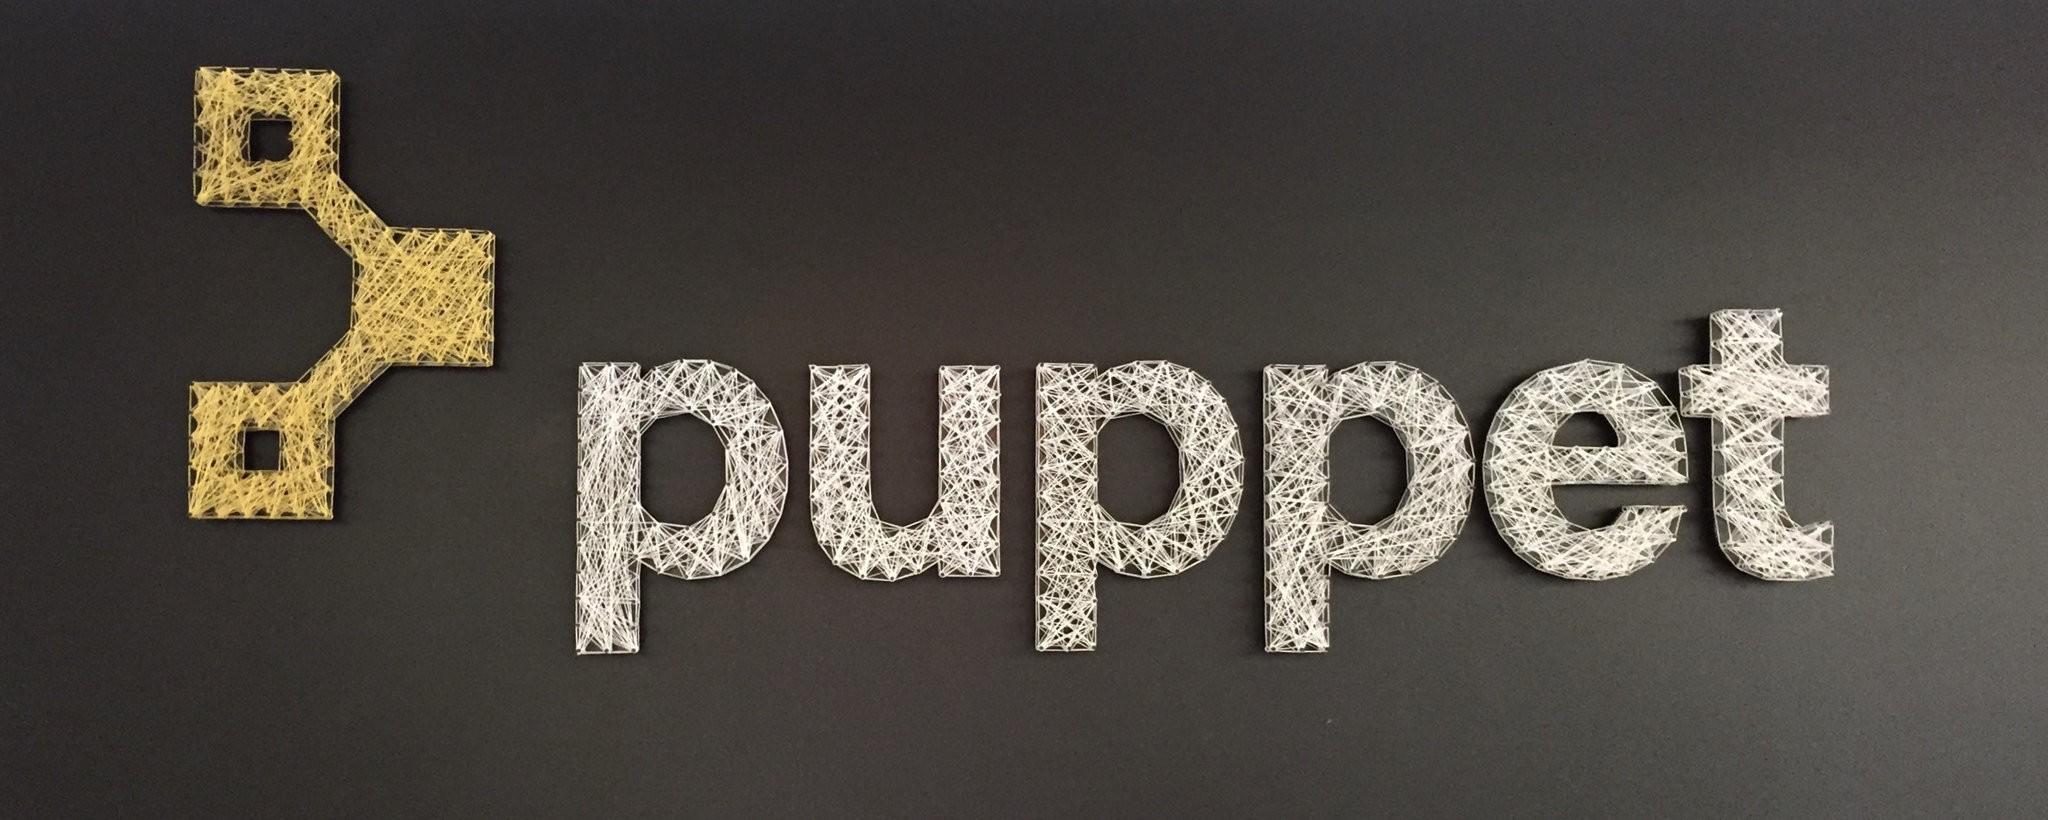 Portland tech company Puppet names new CEO: former VMware